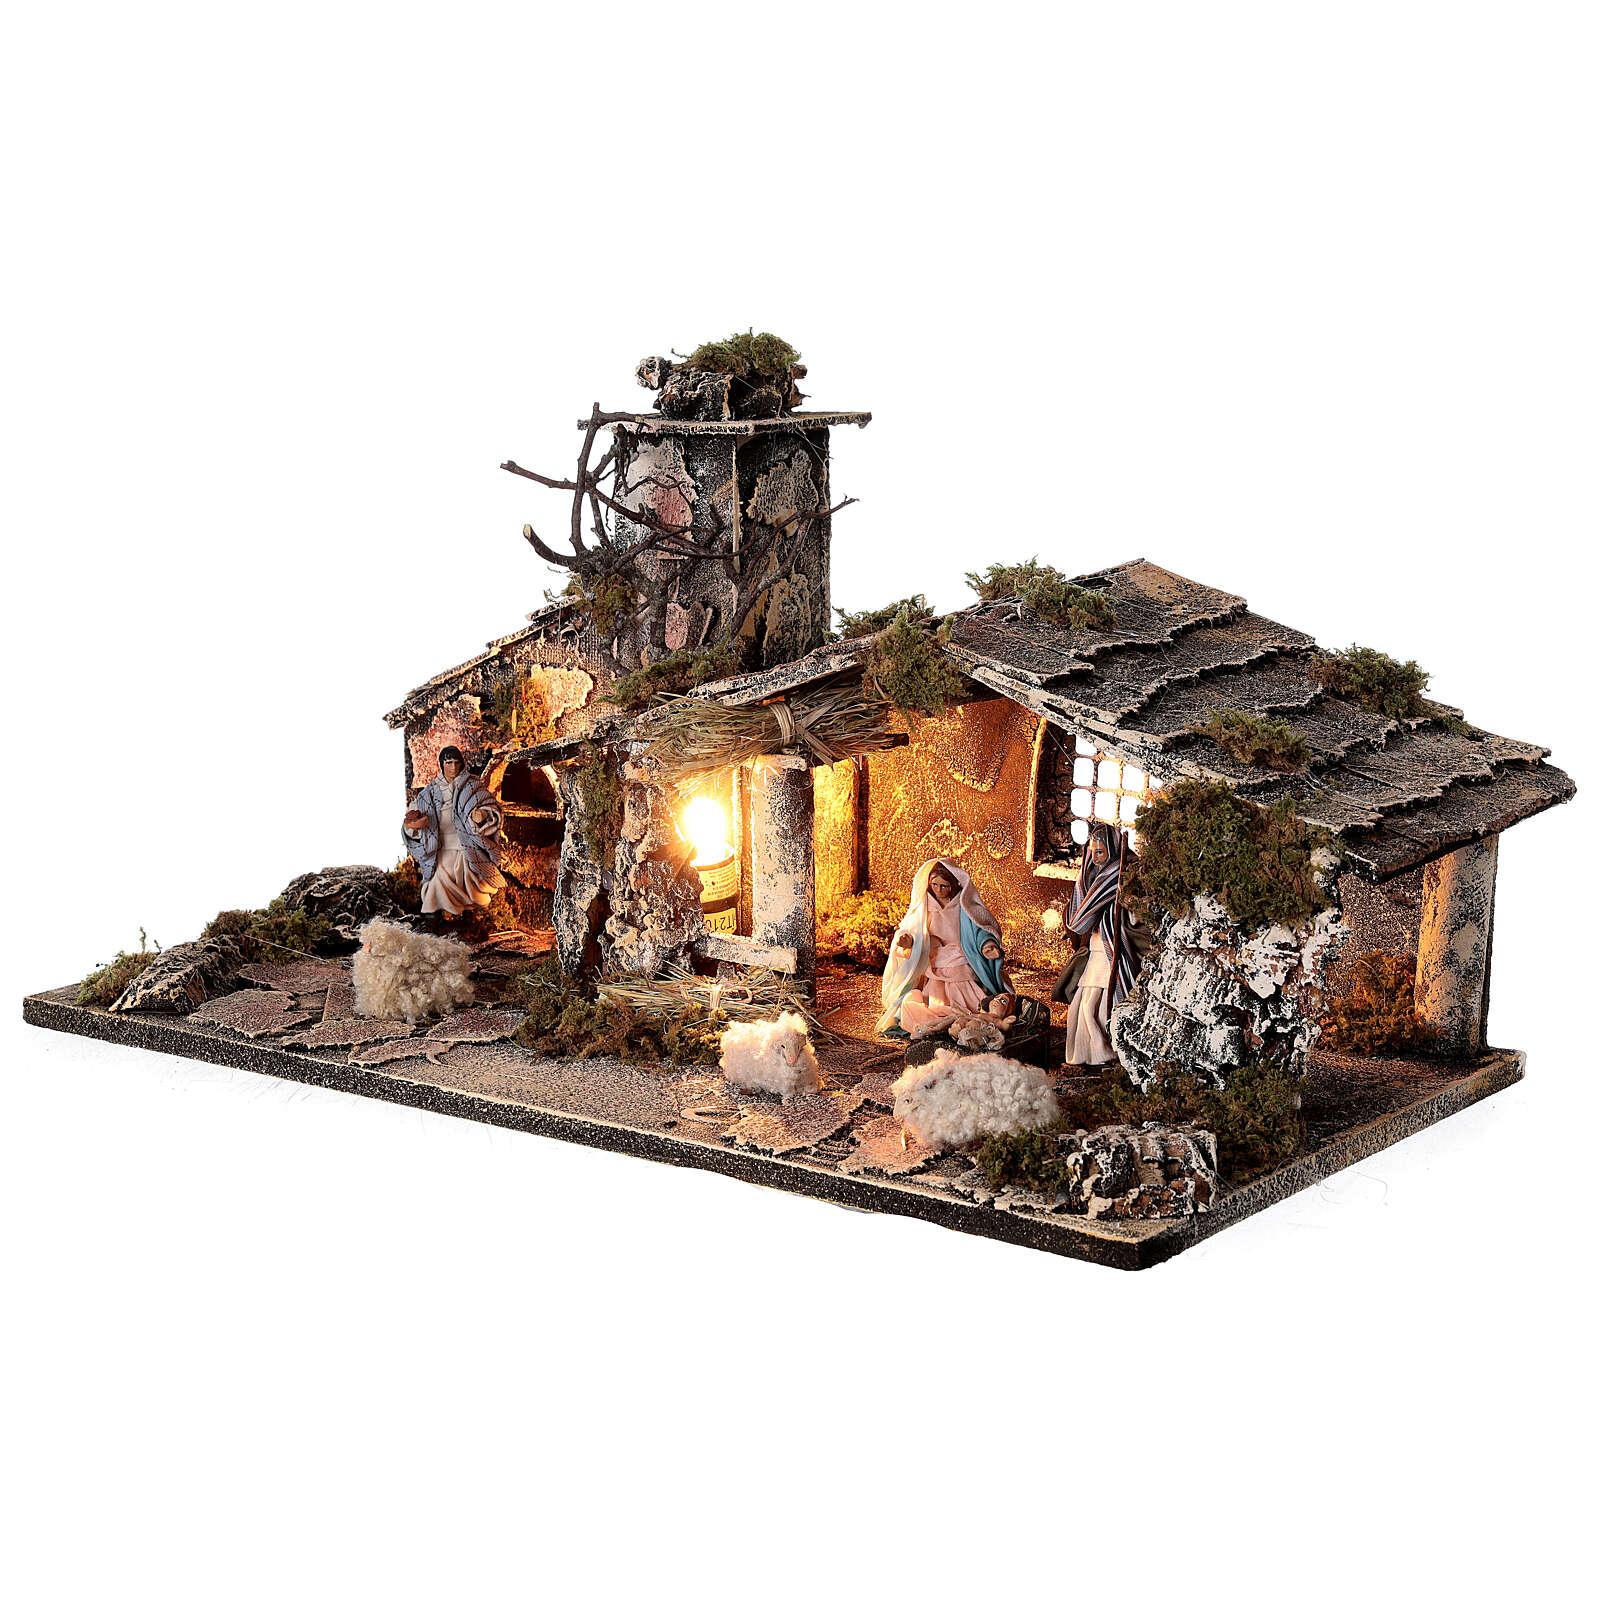 Nativity stable village 8 cm with oven Neapolitan nativity 25x50x25 cm 4